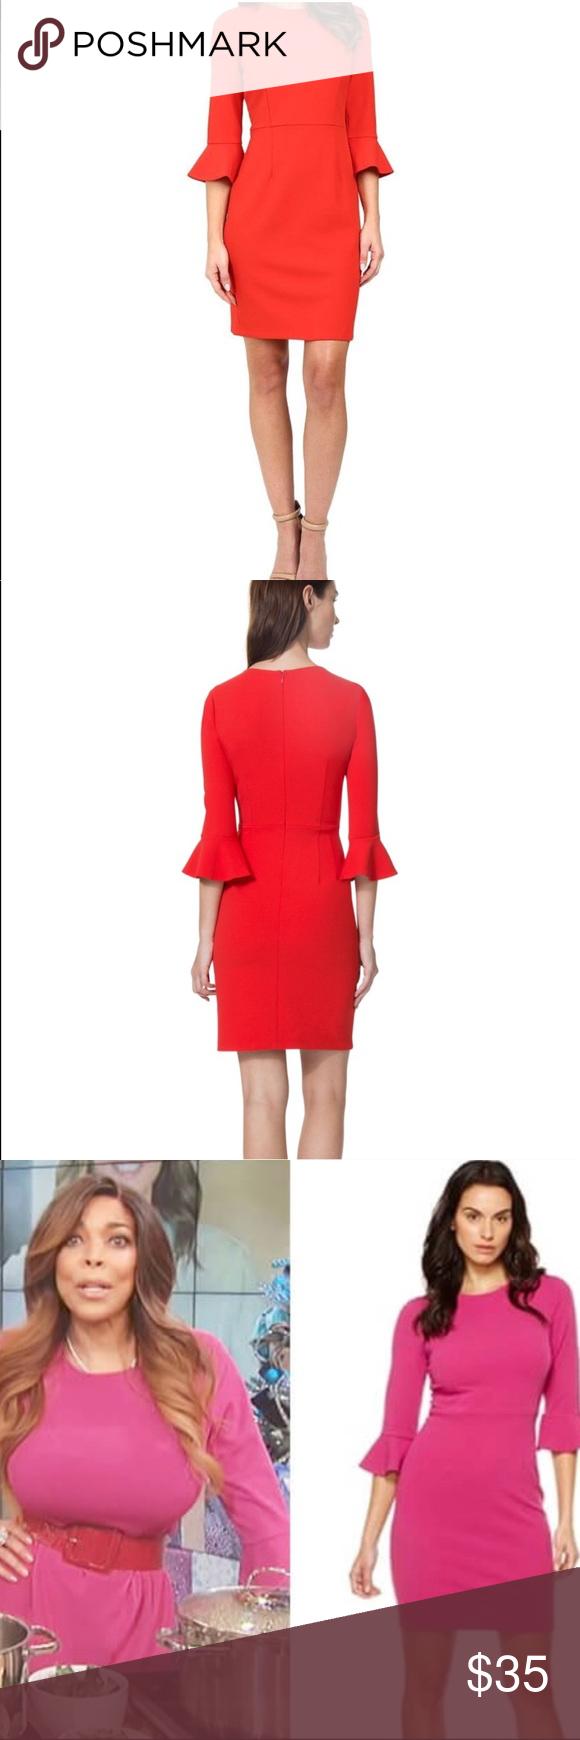 Donna morgan red bell sleeve dress nwt nwt my posh picks